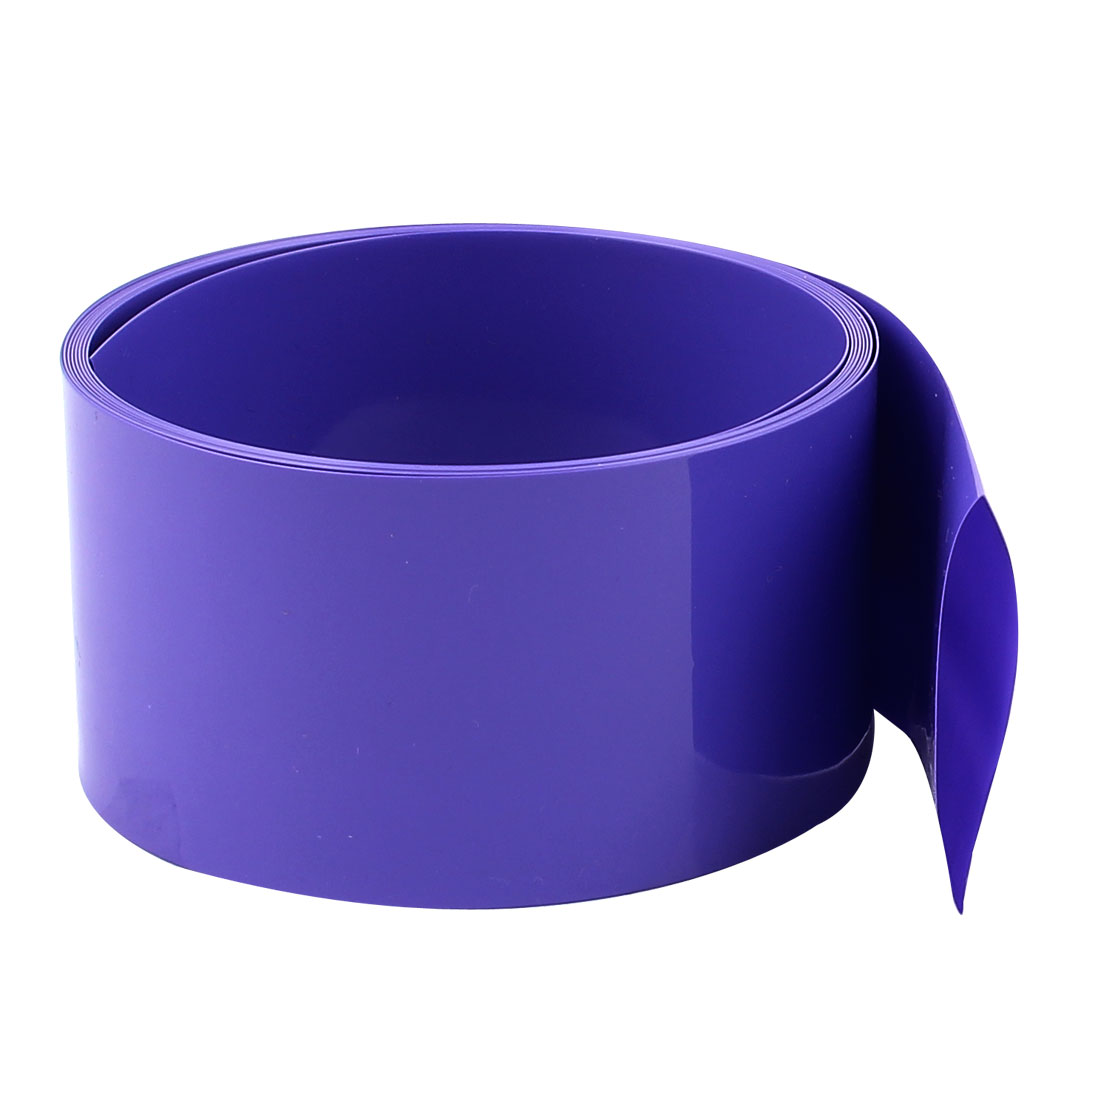 2M 43mm Flat 27mm Dia PVC Heat Shrink Tubing Purple for 1 x 26650 Battery